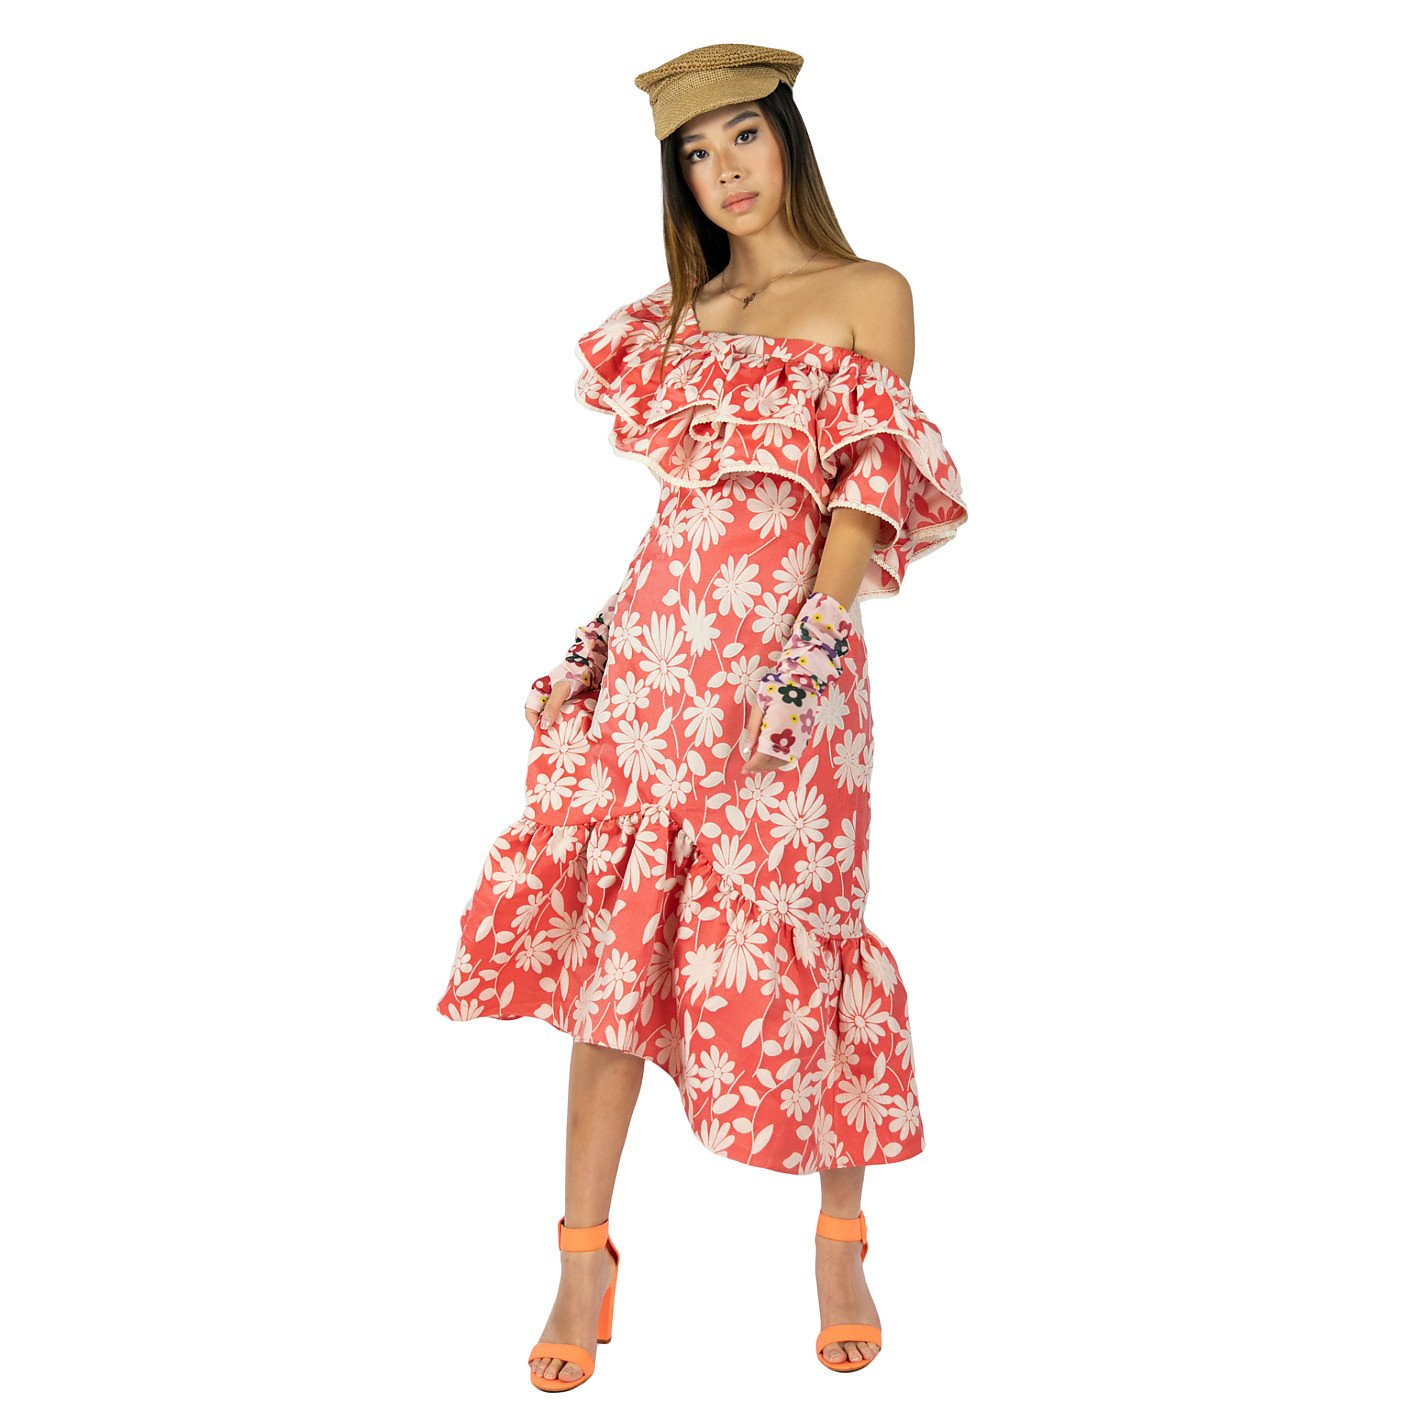 Syra J Floral Pattern Frill Dress